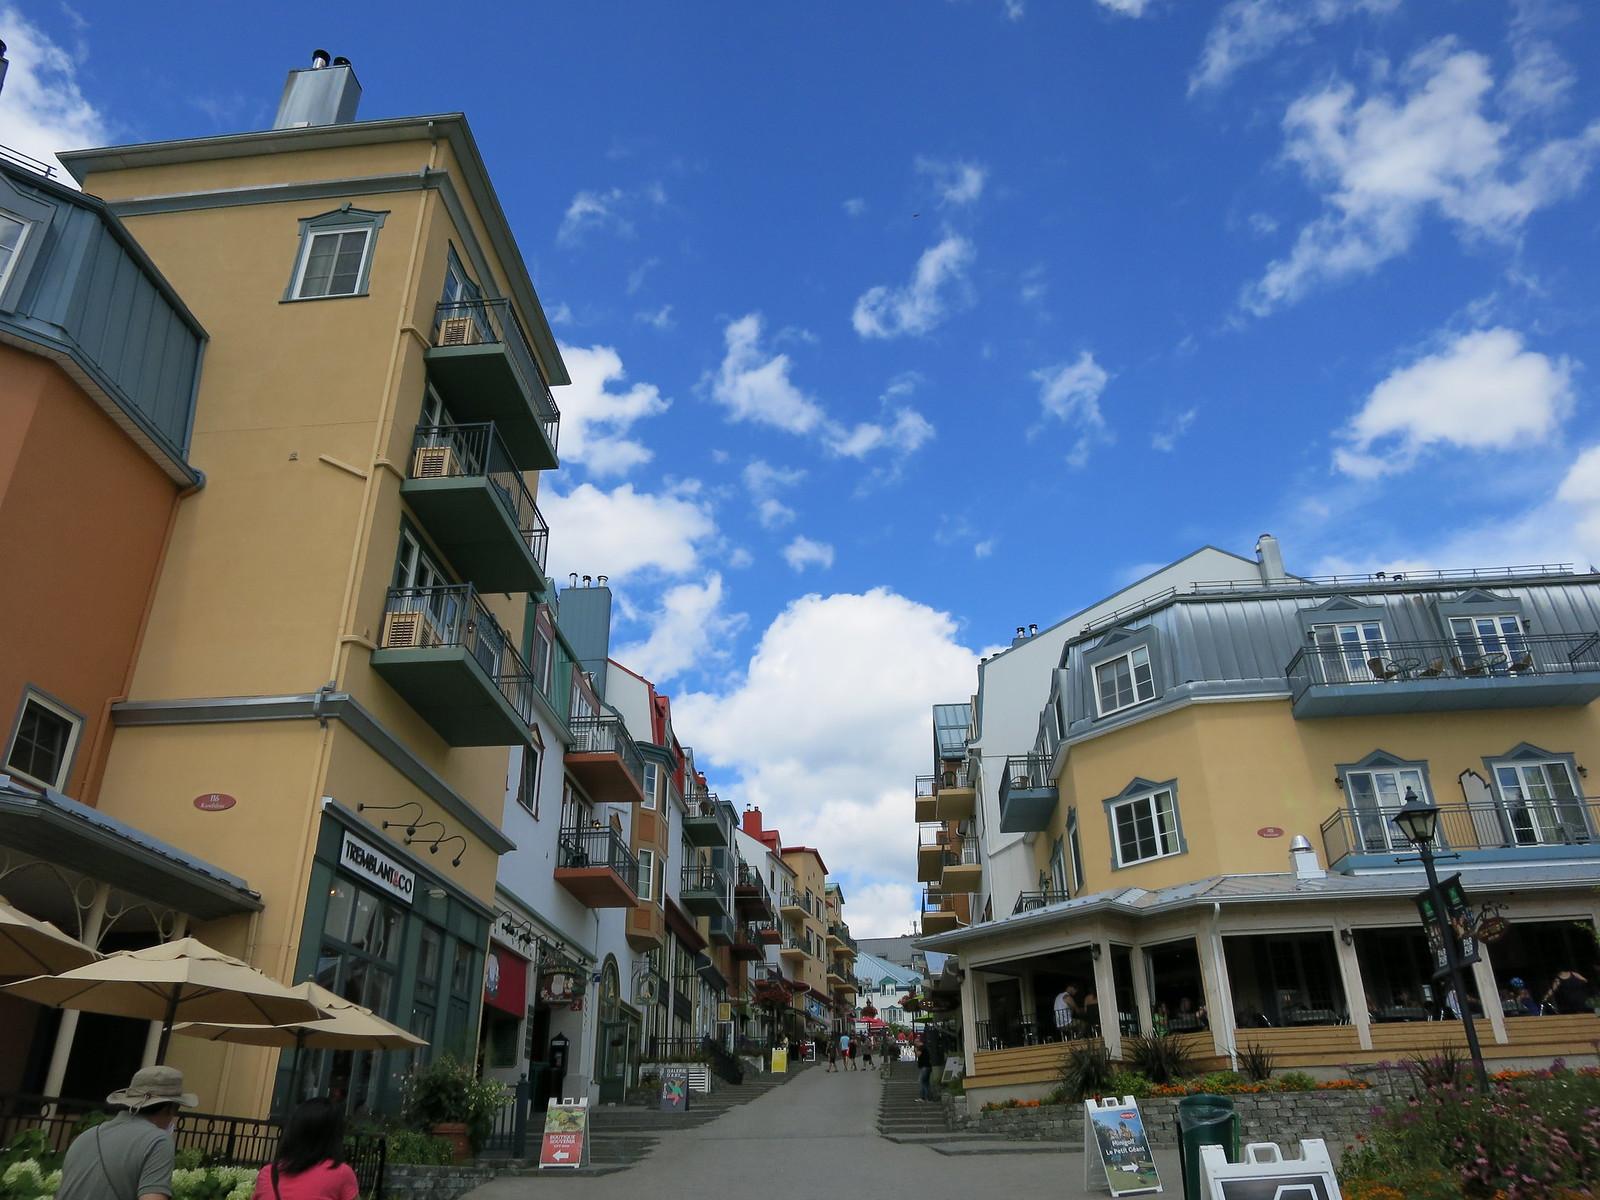 Mont Tremblant Ski Resort buildings